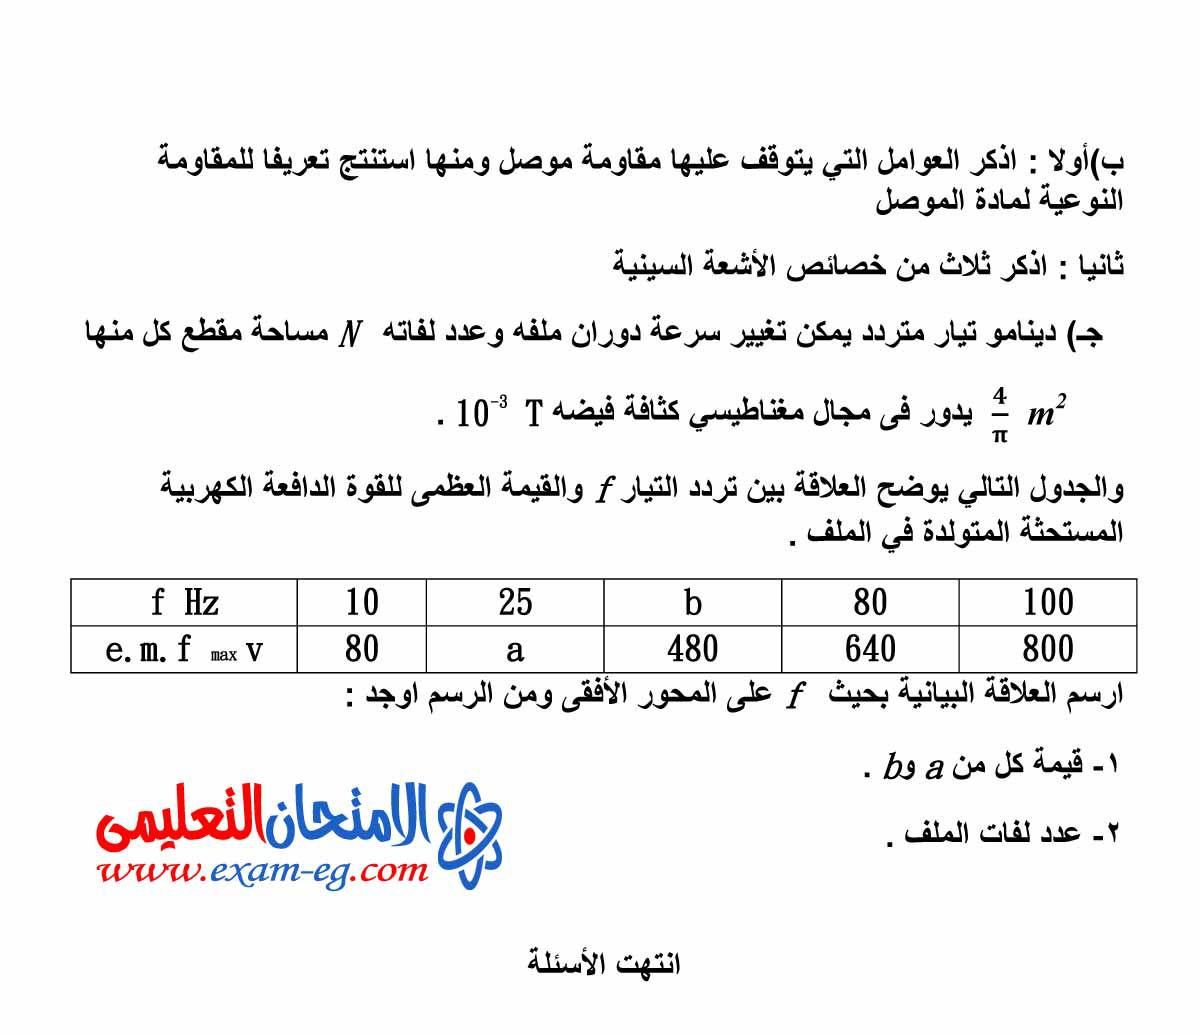 exam-eg.com_1403333913125.jpg